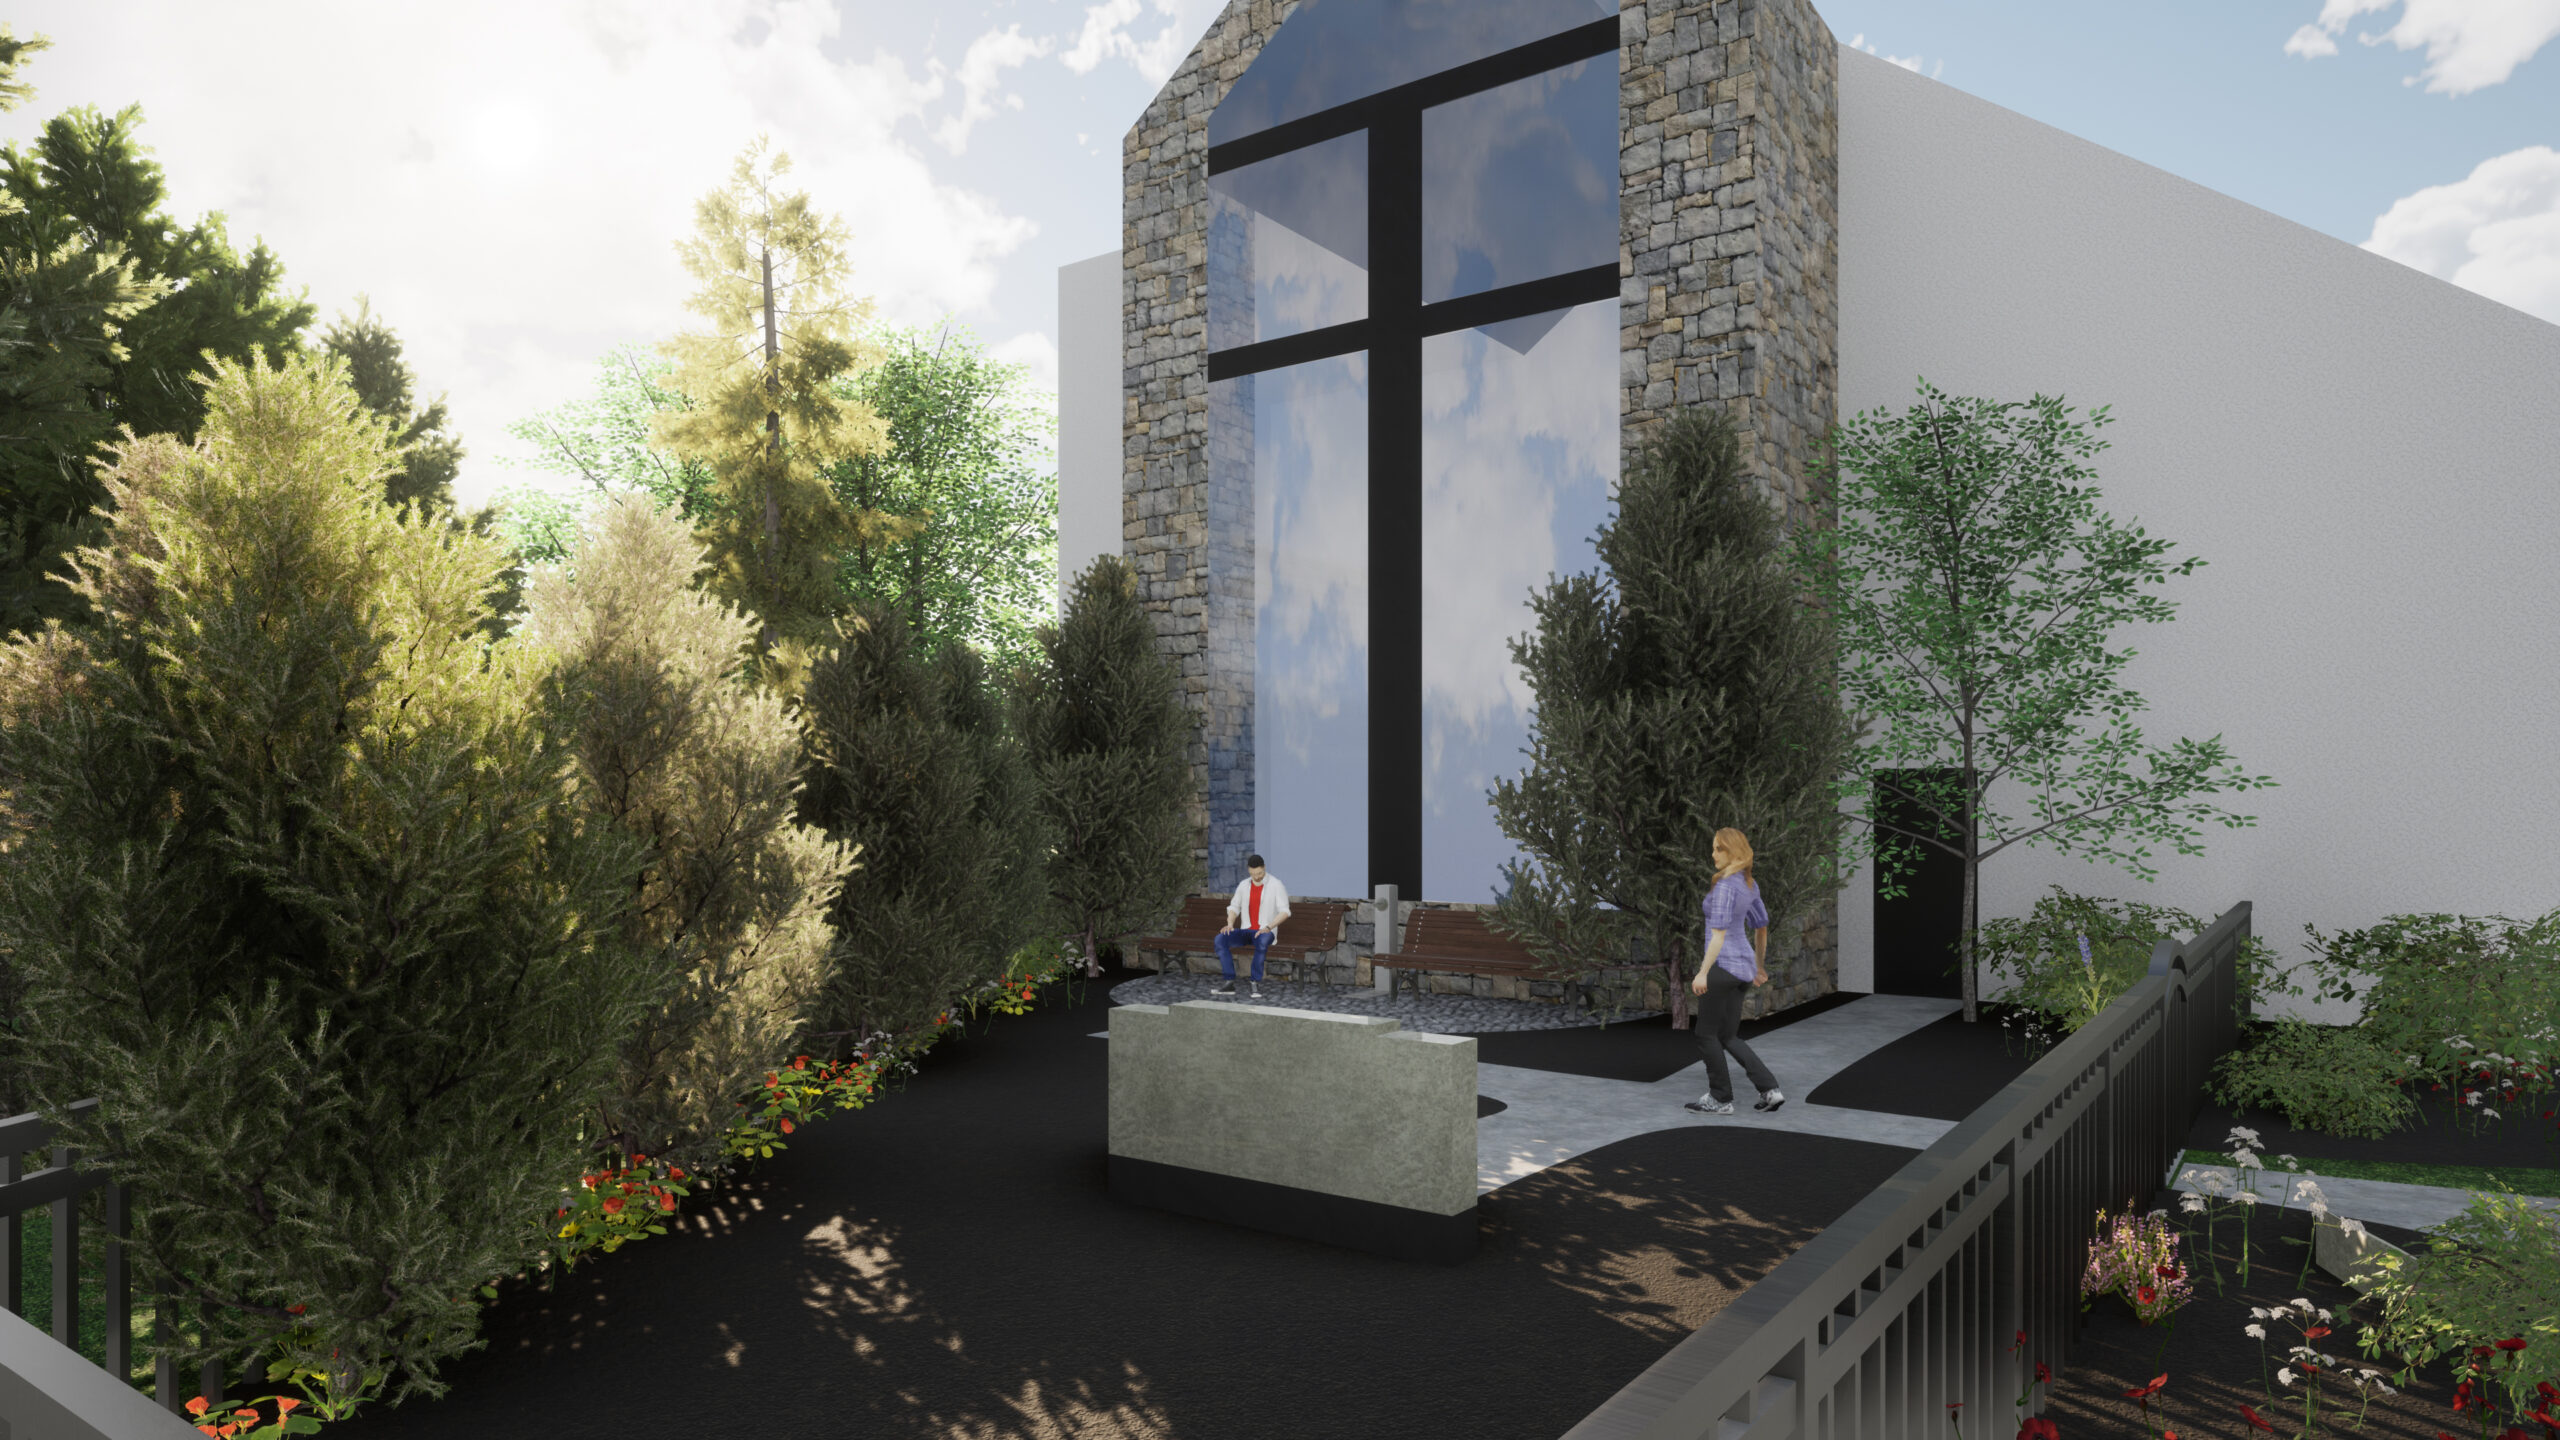 Memorial Garden Rendering for 2020 Beautification - Church View